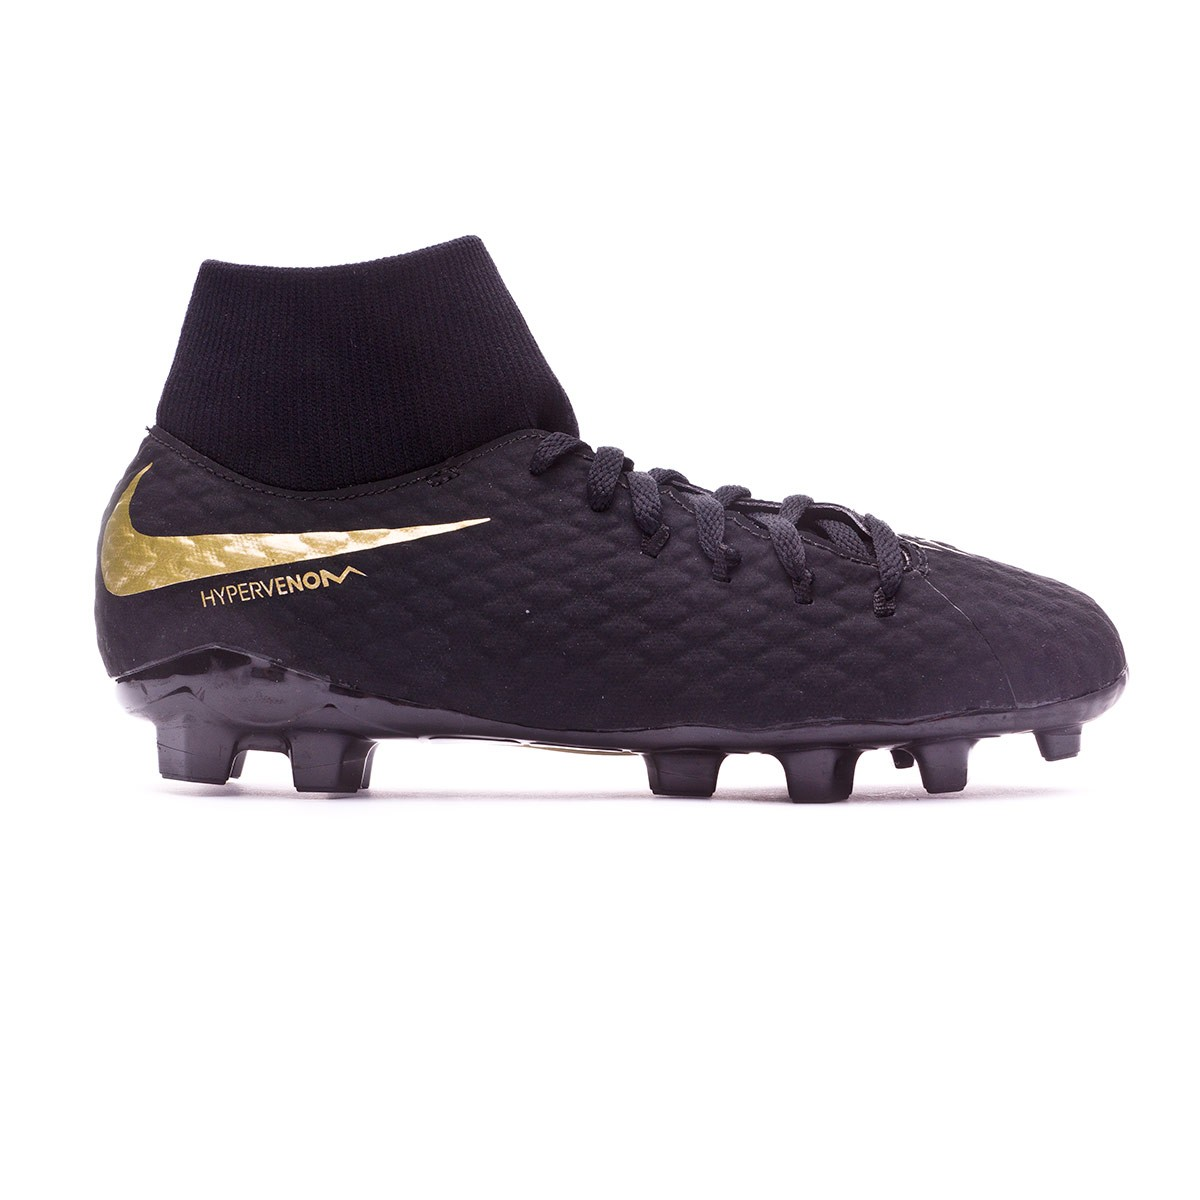 a09eeab4a22 Football Boots Nike Kids Hypervenom Phantom III Academy DF FG  Black-Metallic vivid gold - Tienda de fútbol Fútbol Emotion